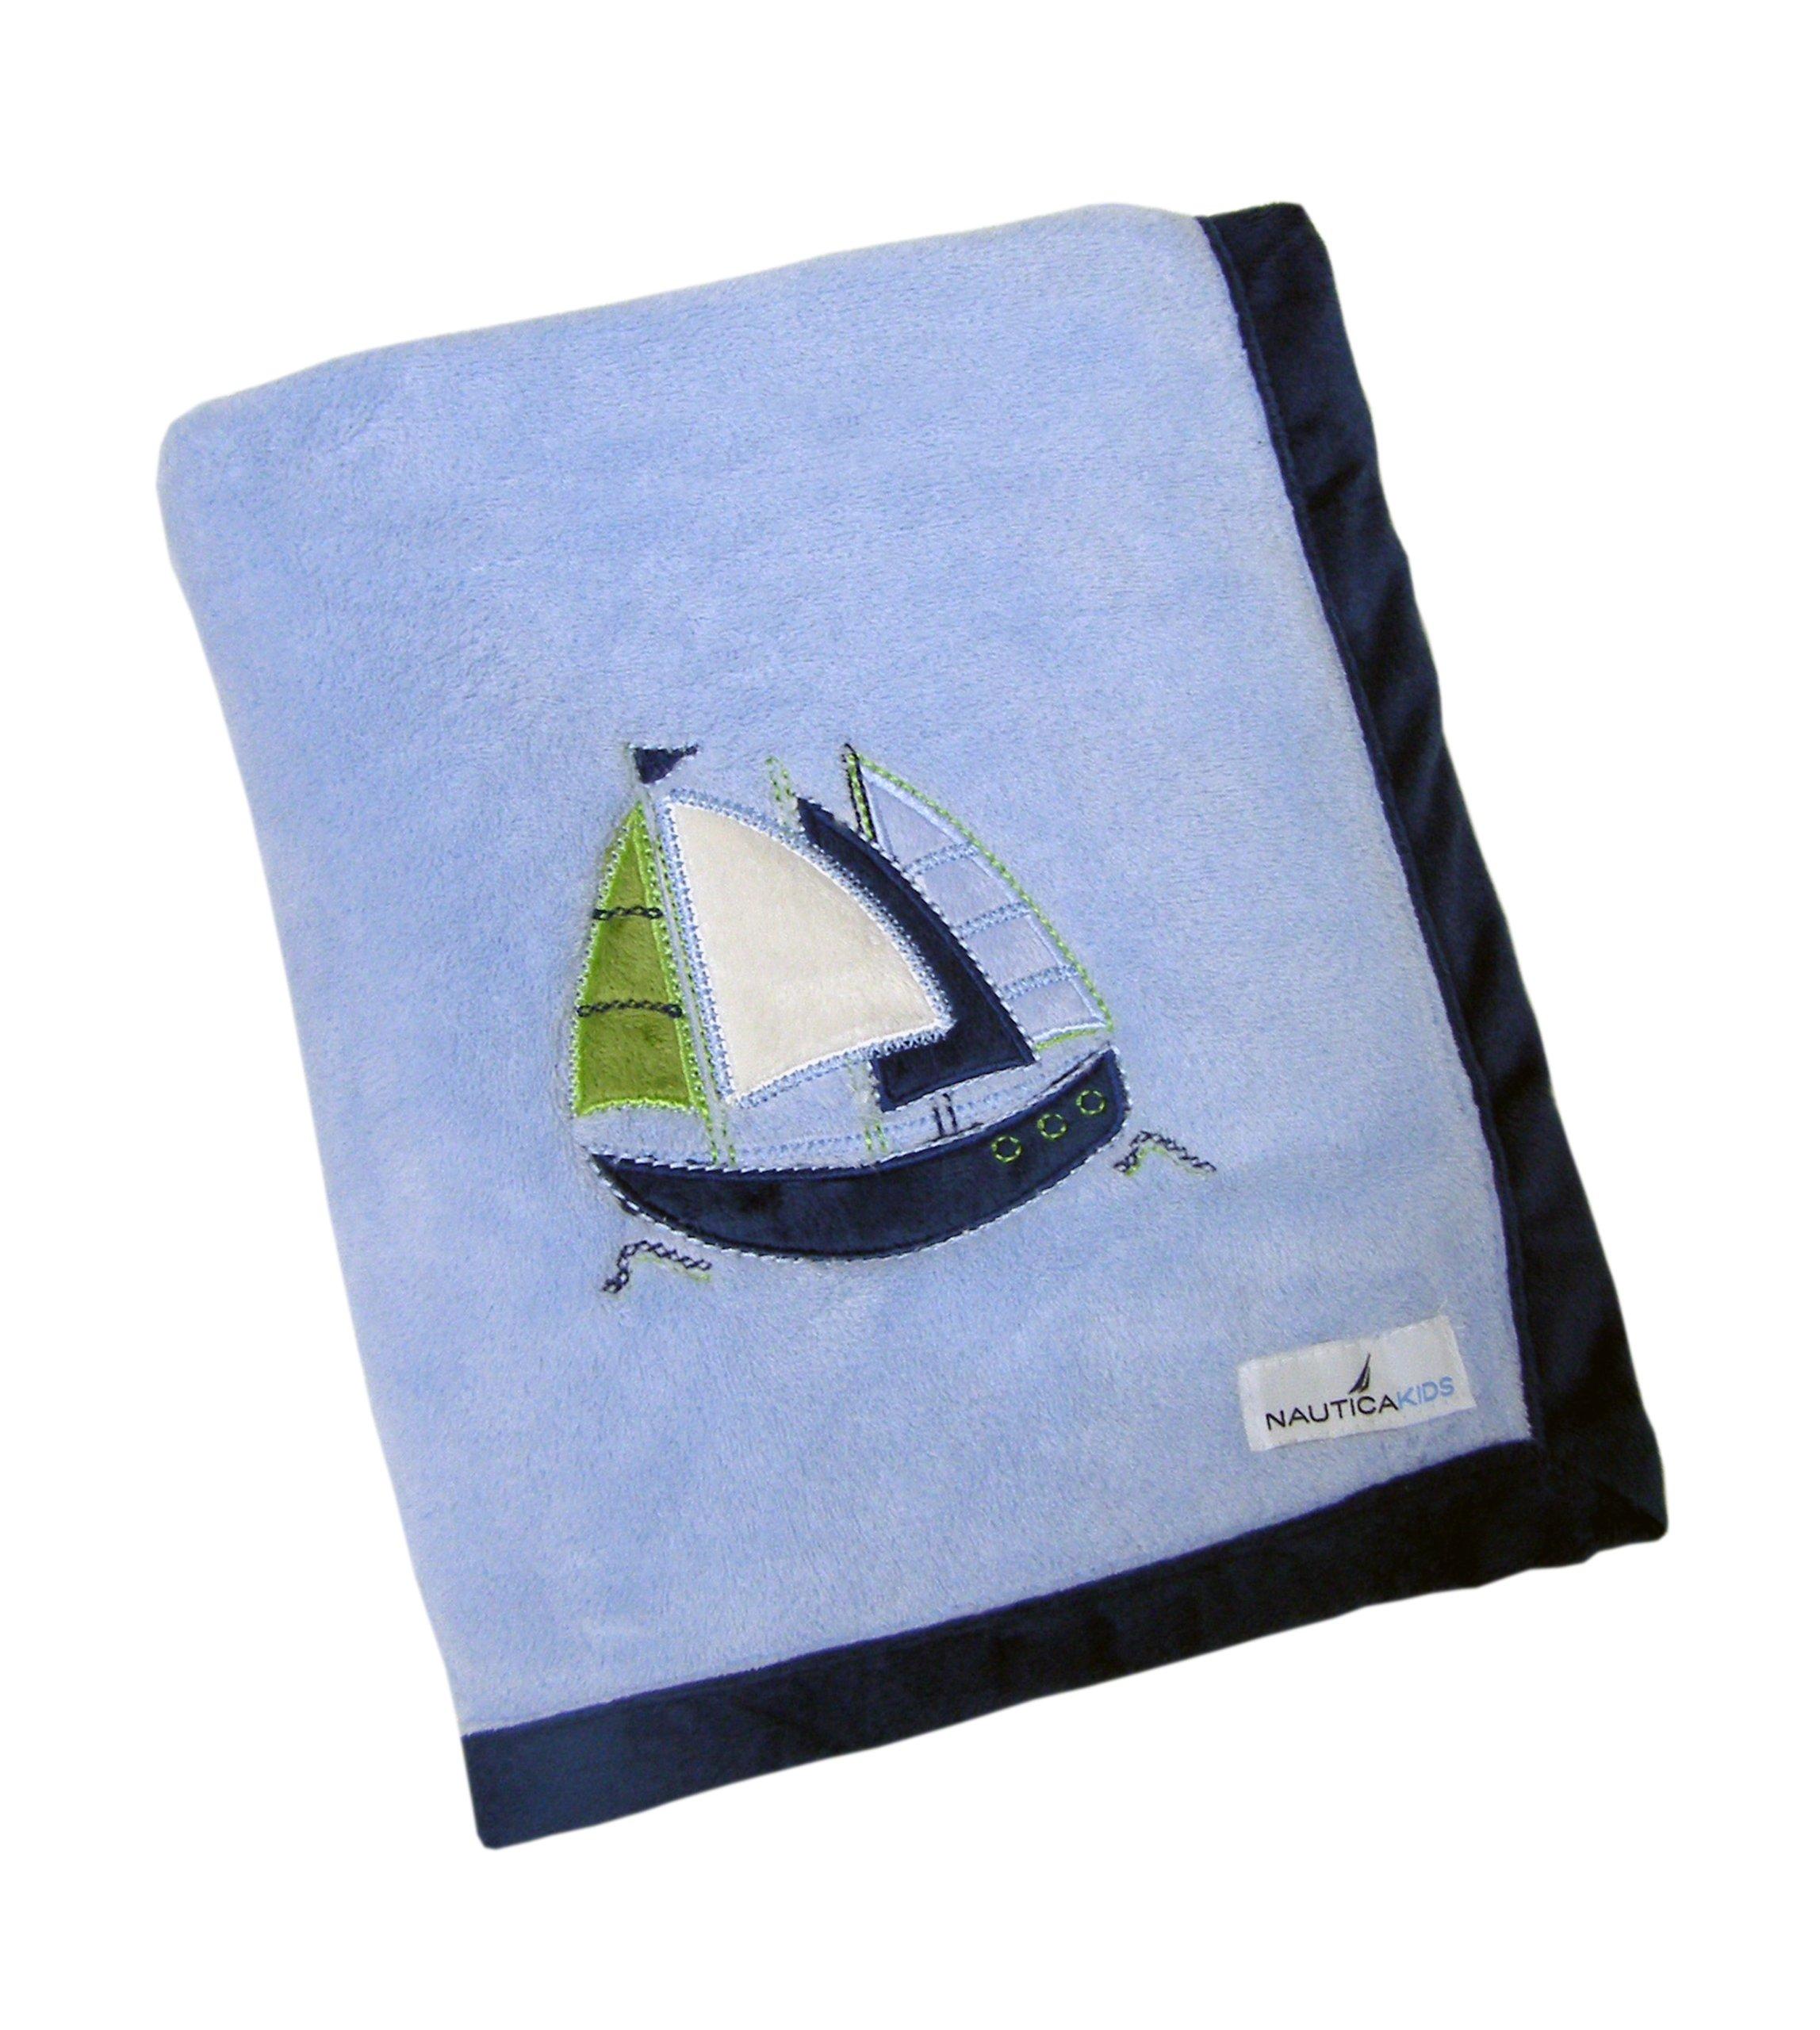 Nautica Zachary Coral Fleece Blanket